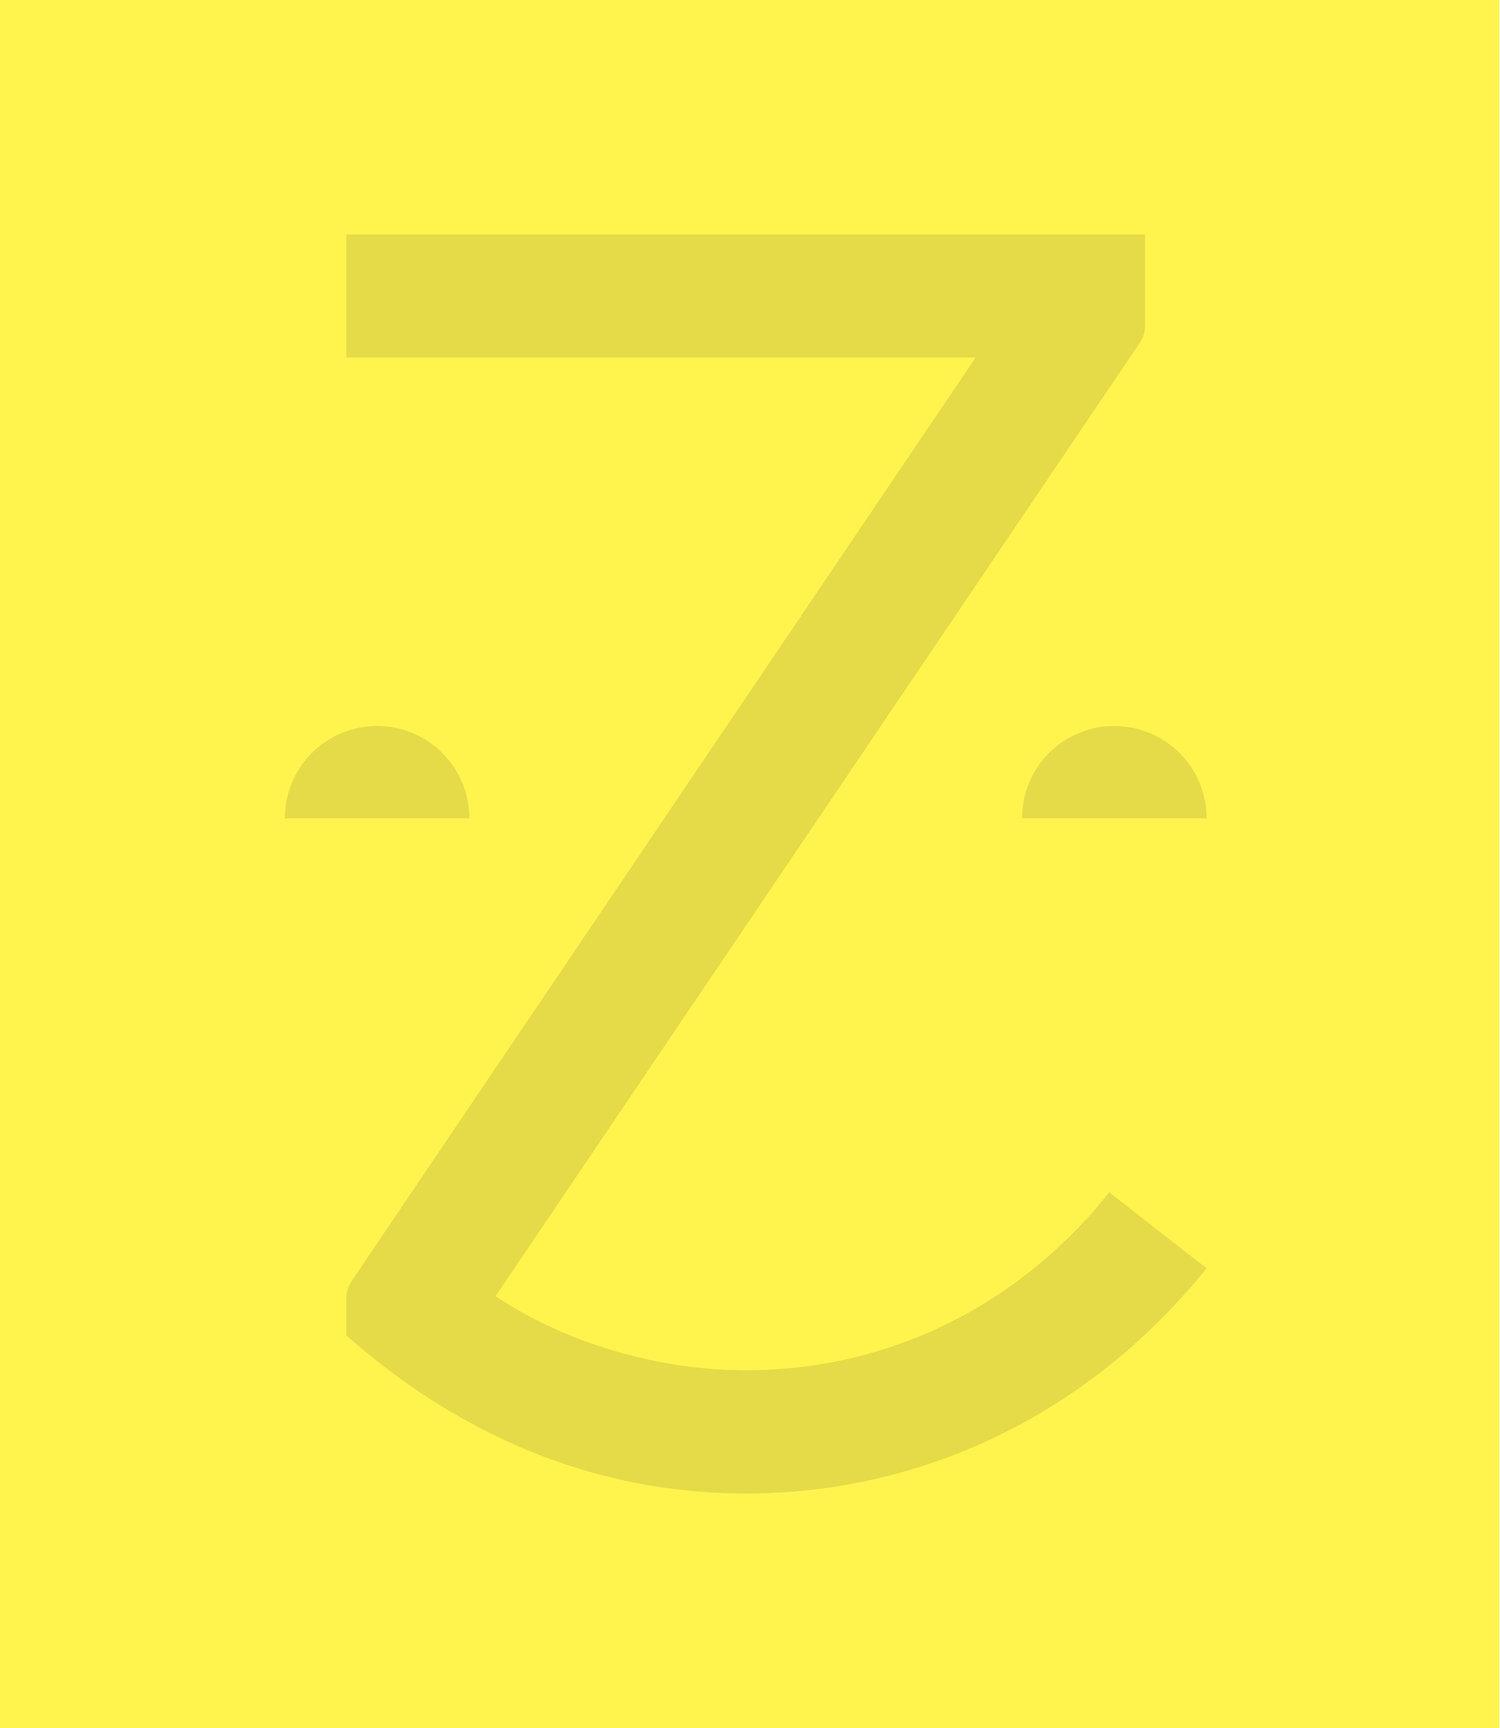 Zocdoc — BAZOS PROJECTS